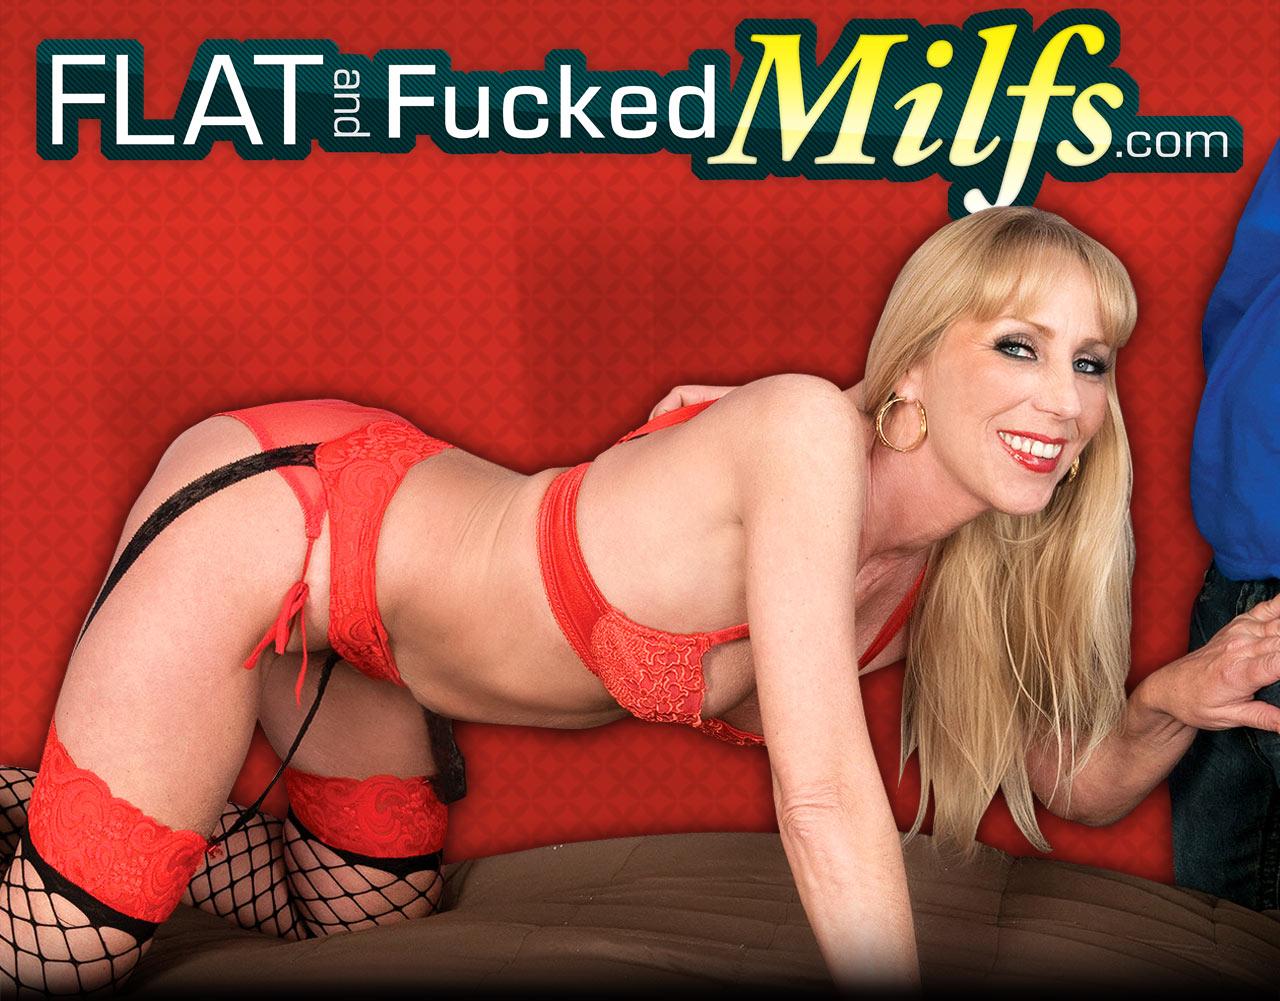 flatandfuckedmilfs.com